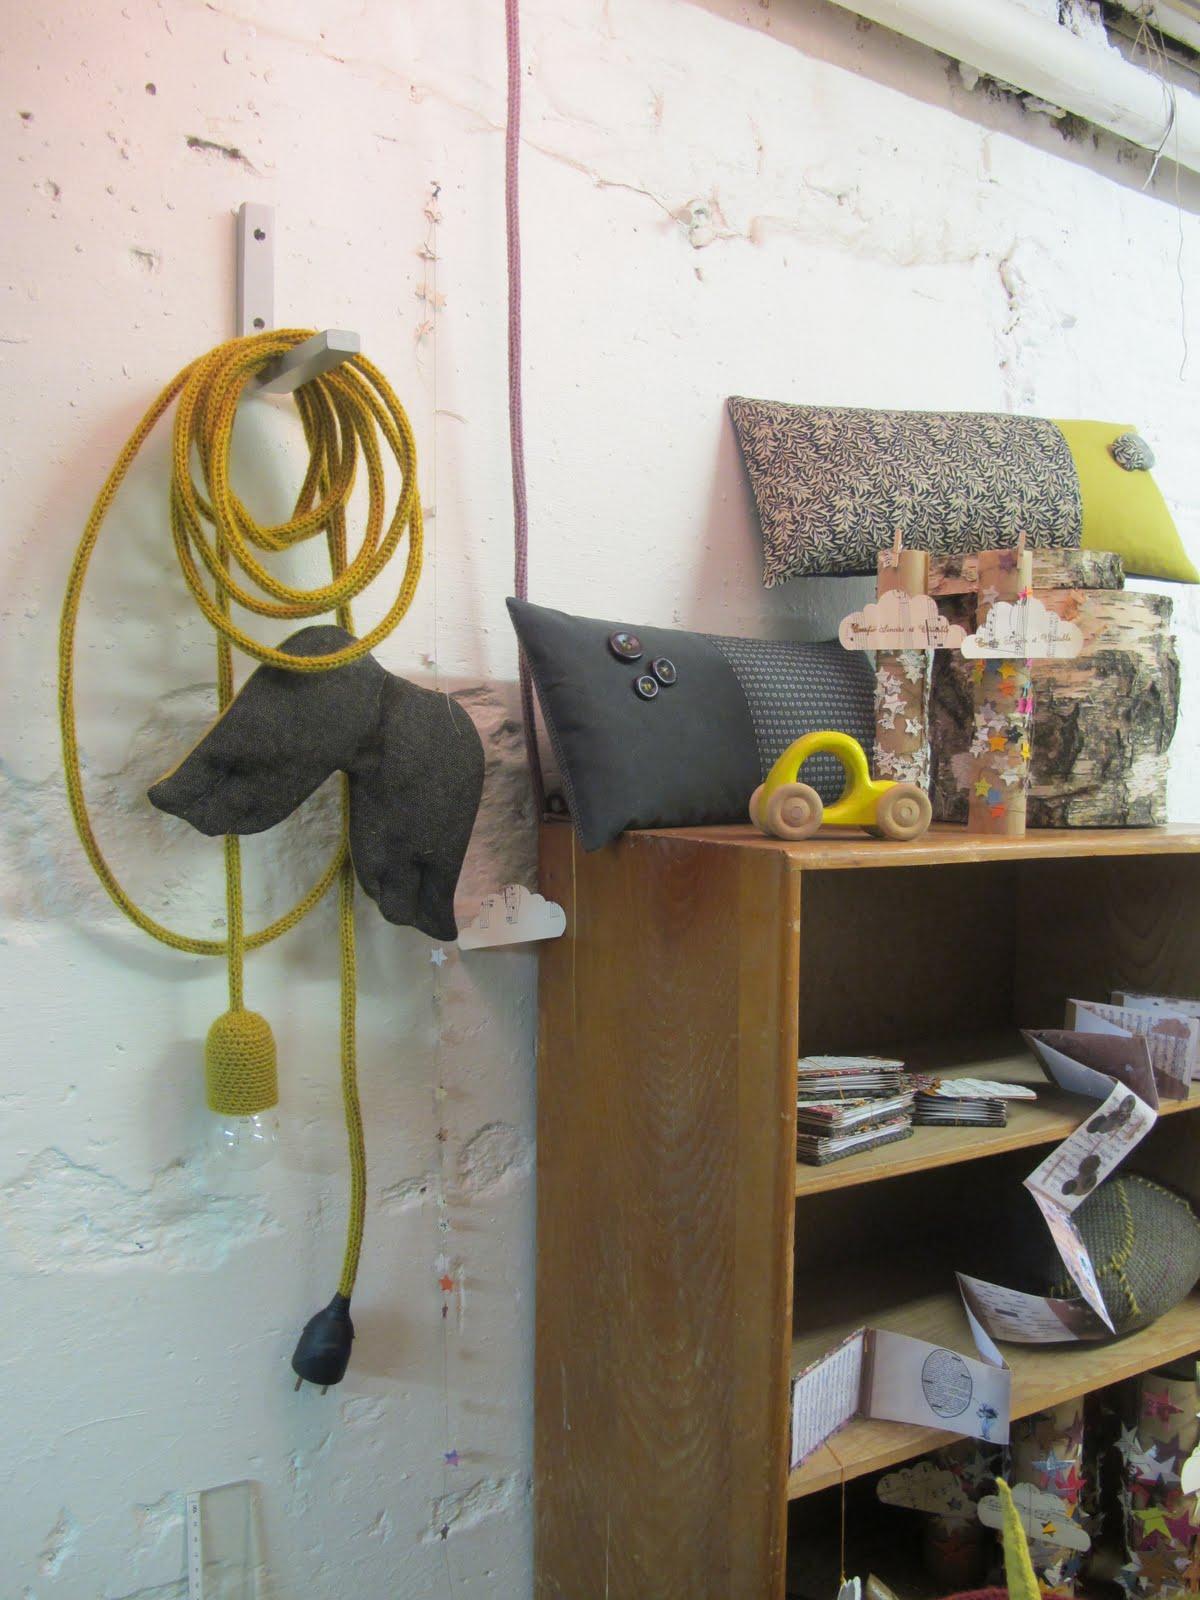 D saccord portes ouvertes l 39 atelier - Atelier chardon savard portes ouvertes ...